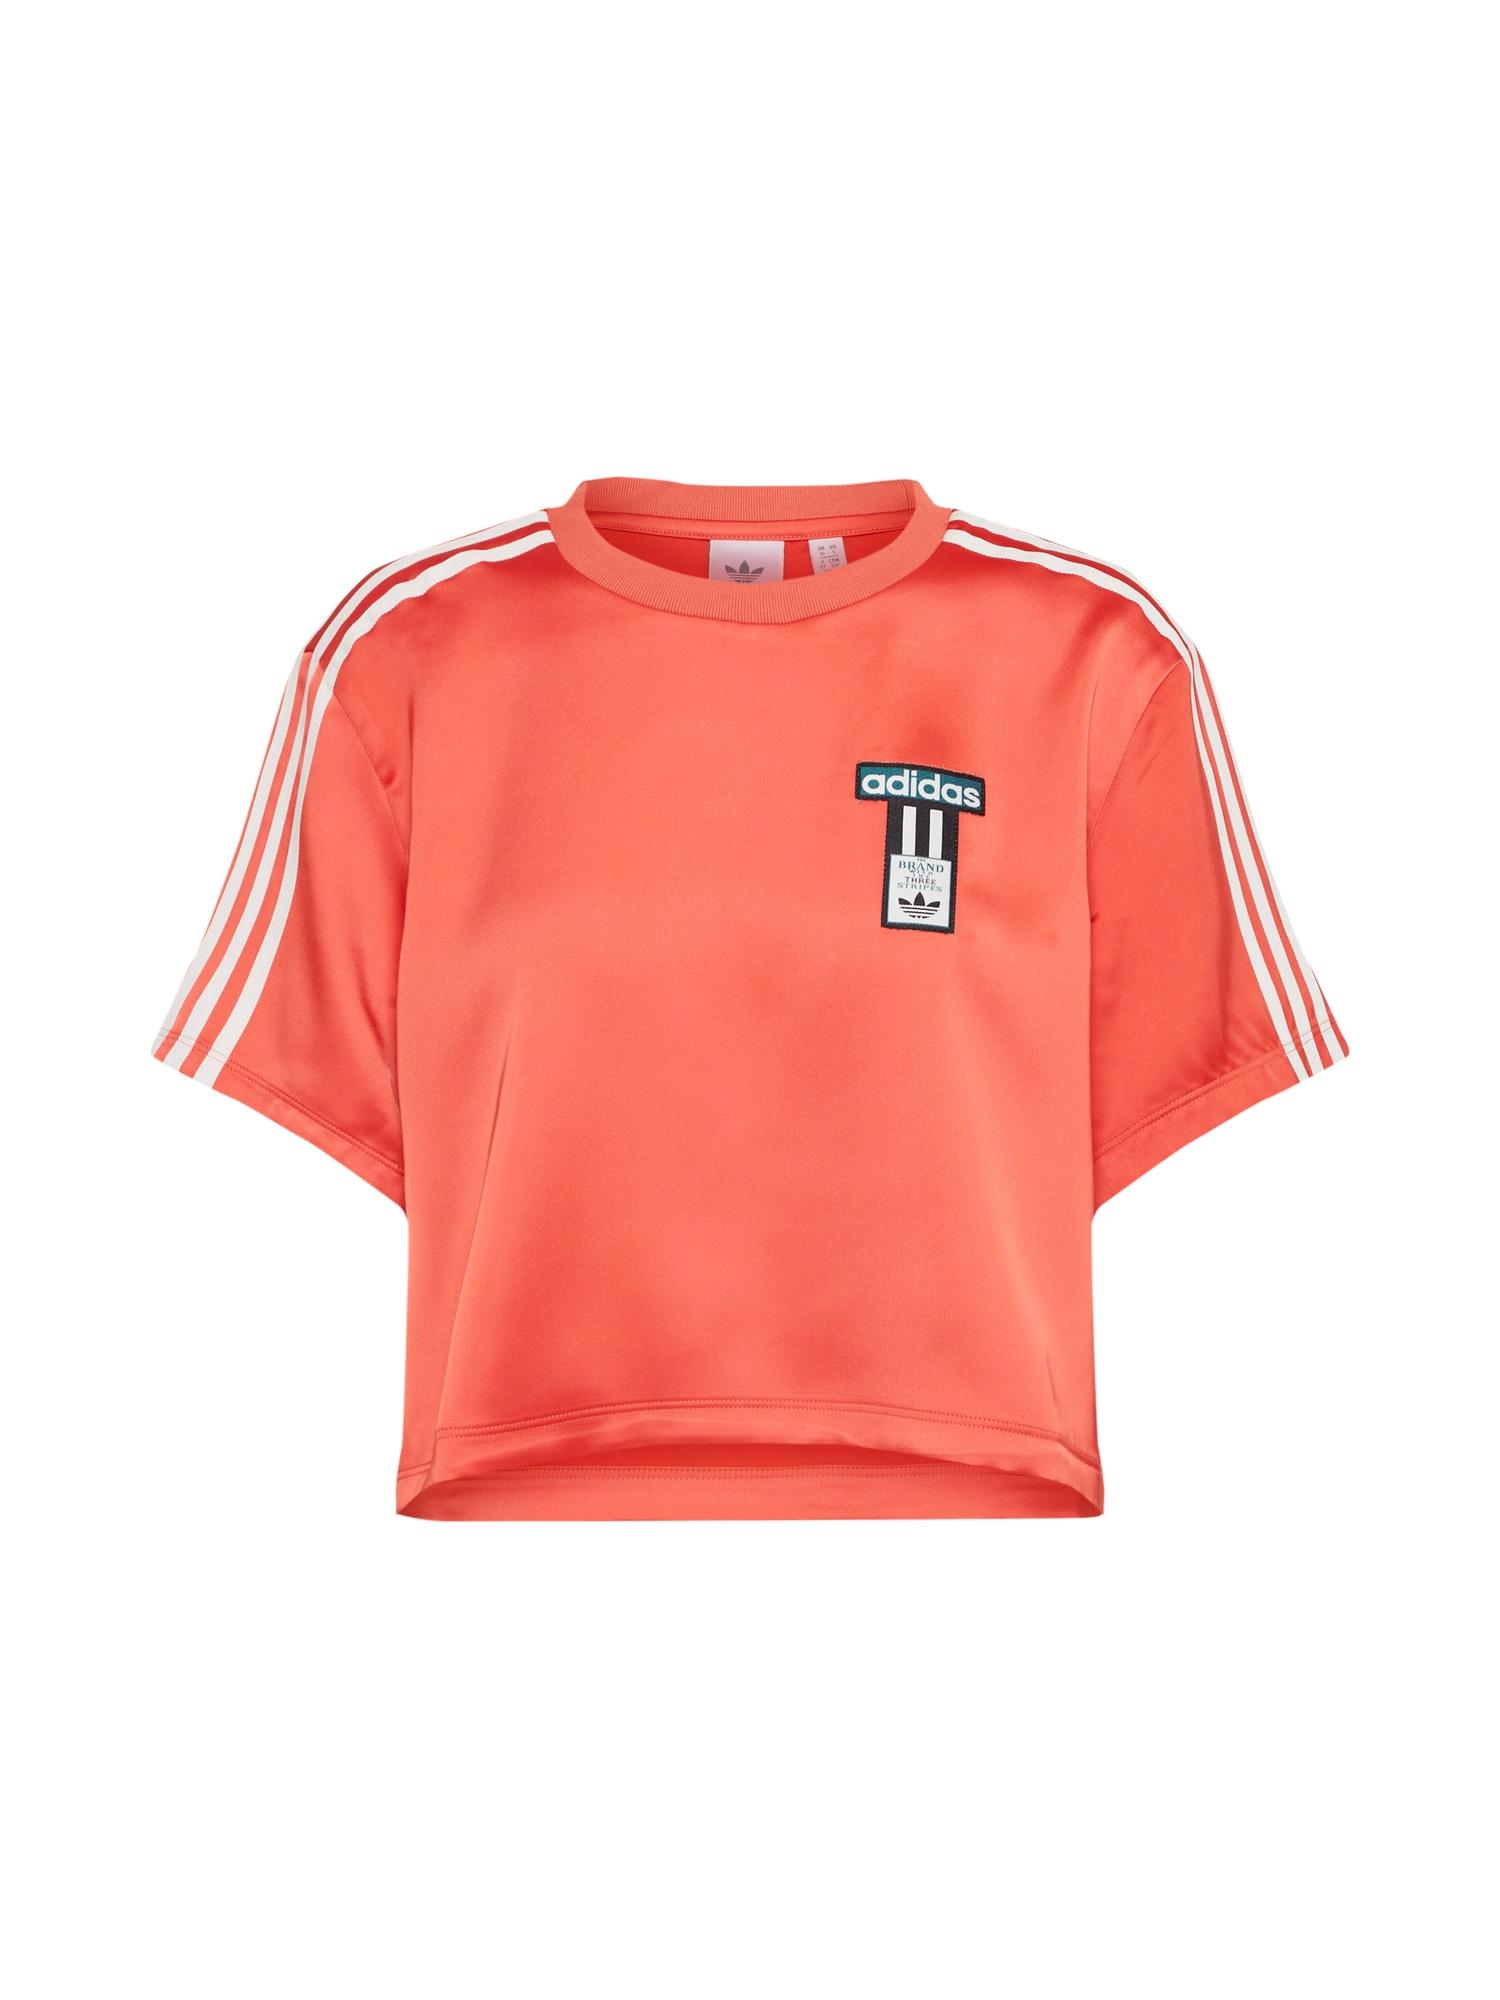 ADIDAS ORIGINALS, Dames Shirt 'ADIBREAK T-SHIRT SATIN', kreeft